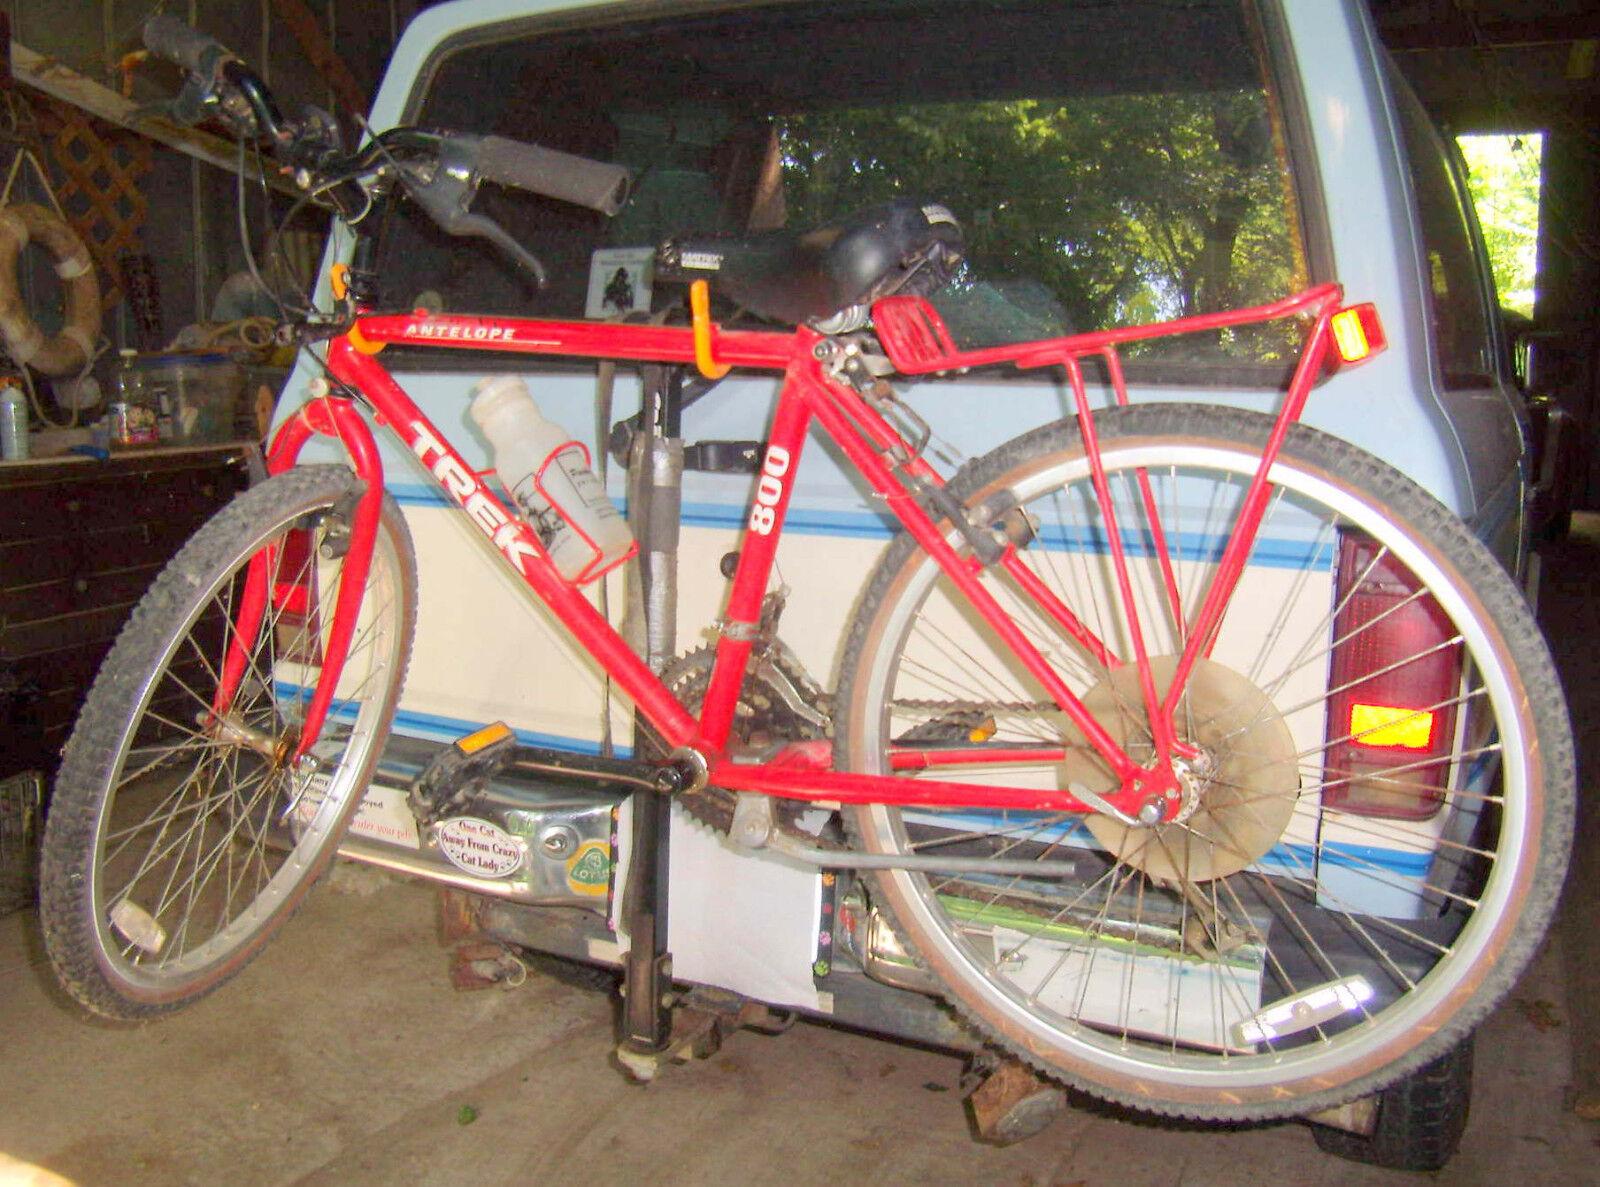 Vintage Red Trek 800 Antelope Mountain Bike Bicycle -Graber auto carrier